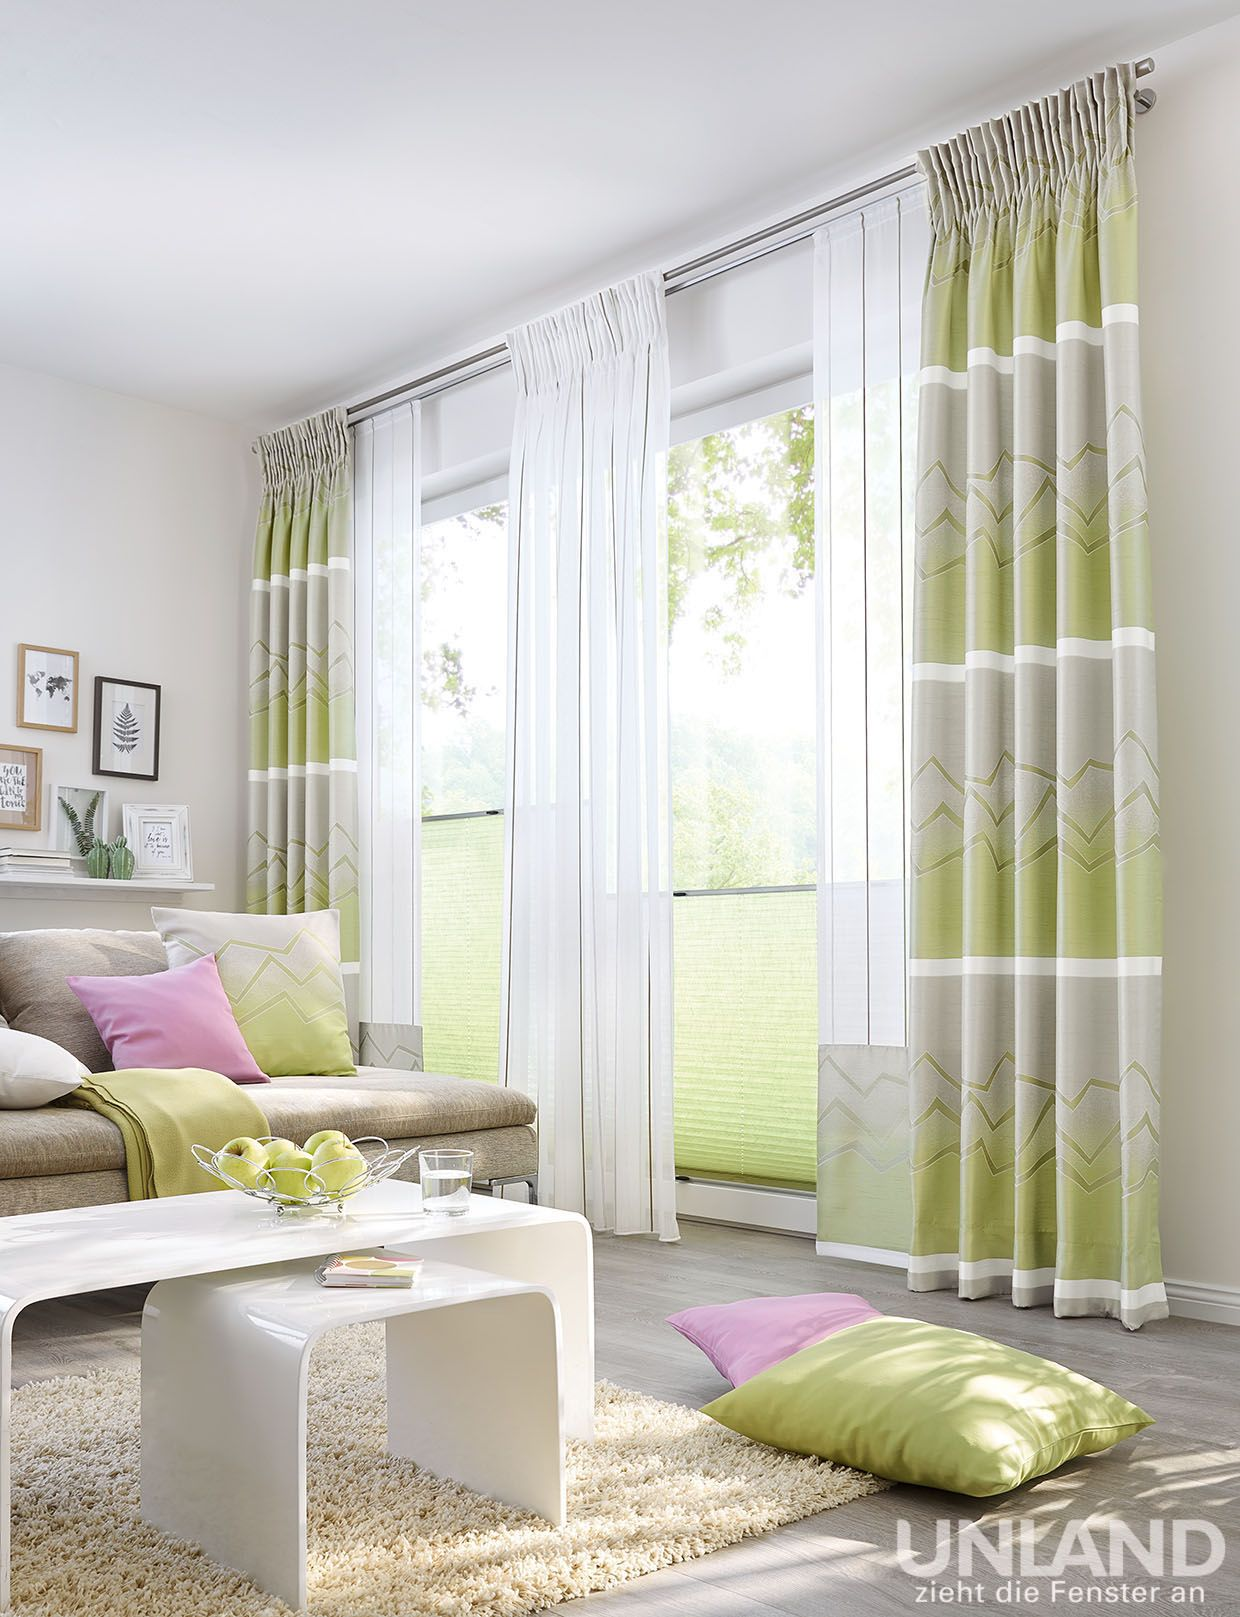 Unland Zeno Greenery 001 Vorhang Fensterideen Gardinen Und Sonnenschutz Curtains Contract Fabrics Gardinen Wohnzimmer Vorhänge Gardinen Gardinen Ideen